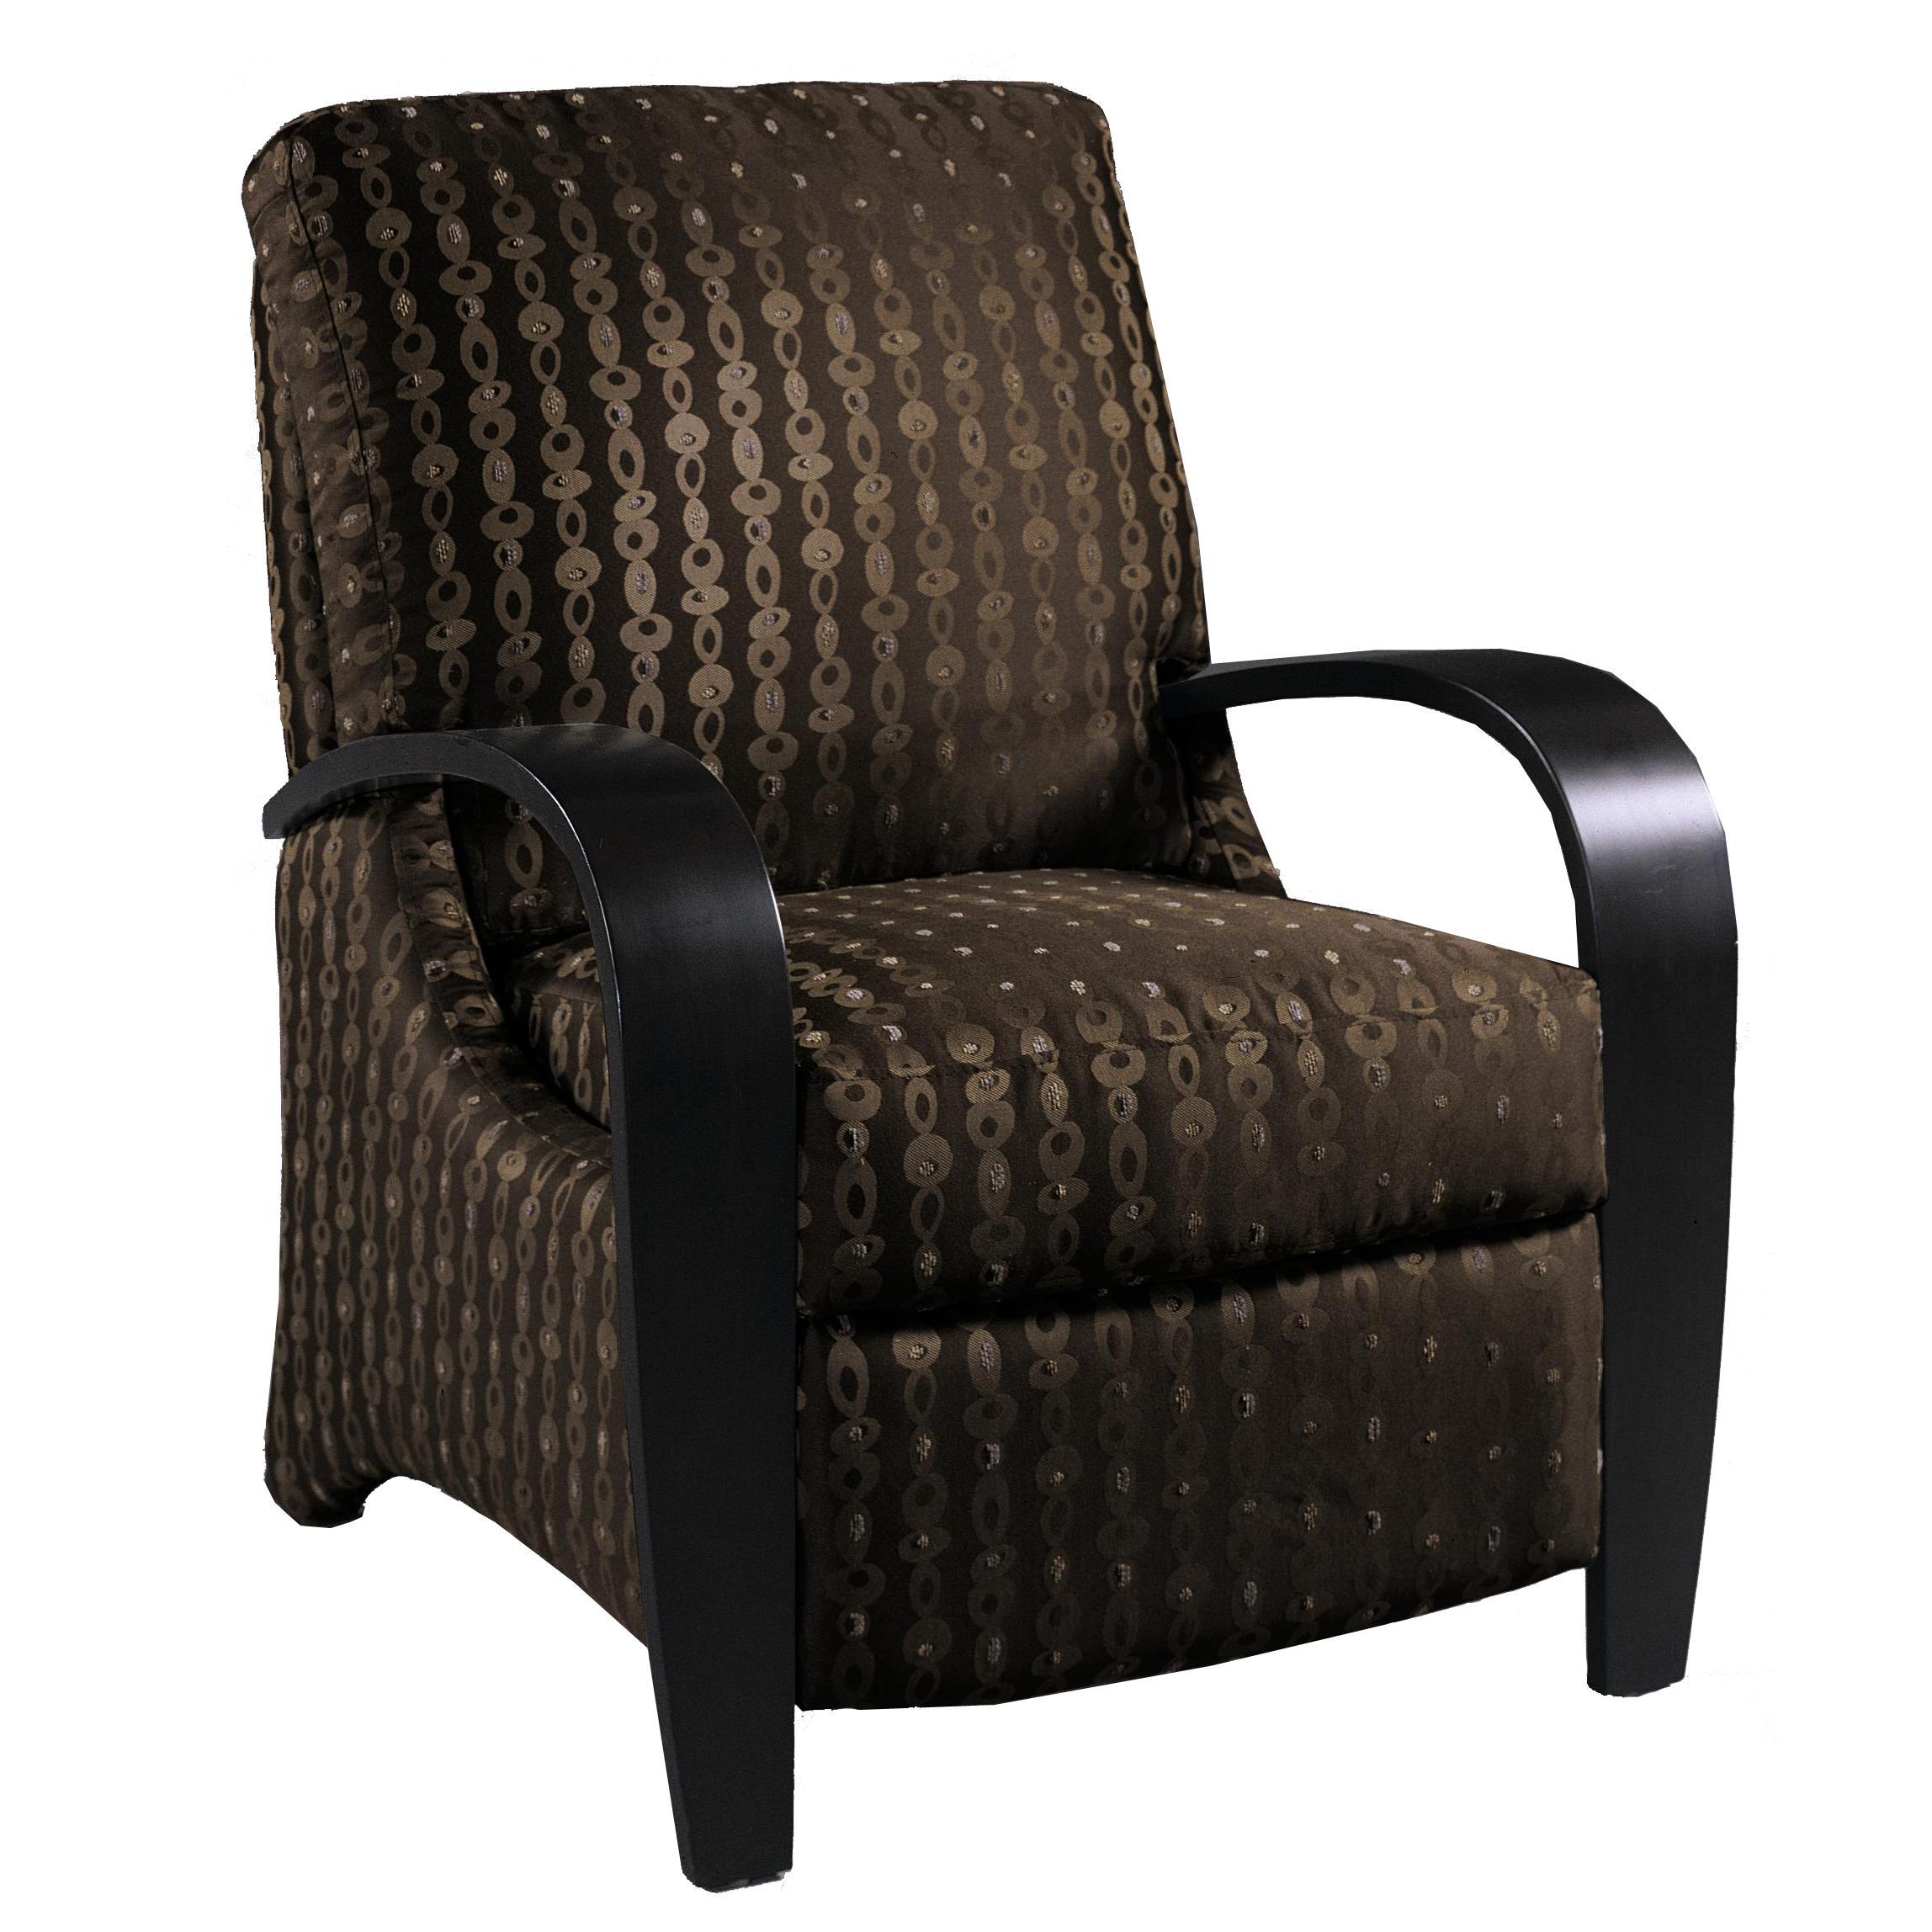 recliner rocker by upholstery reviews bent simmons arm peak furniture bryce pdx wayfair loon